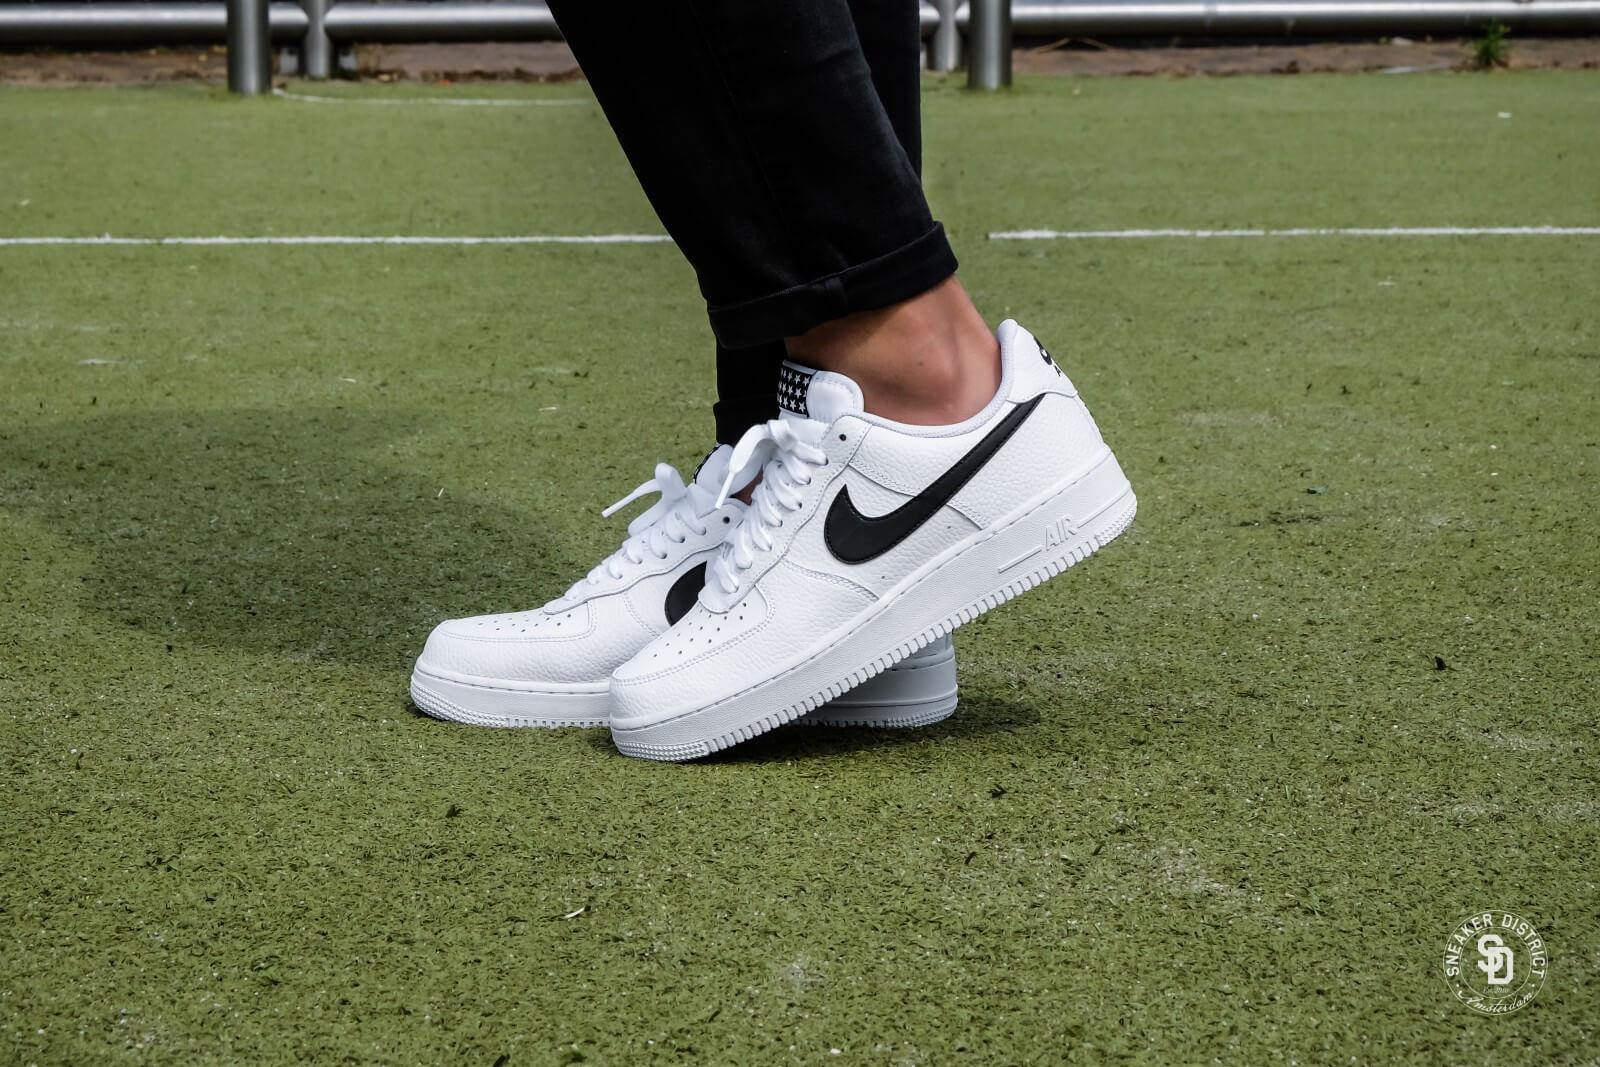 Nike Air Force 1 '07 White/Black